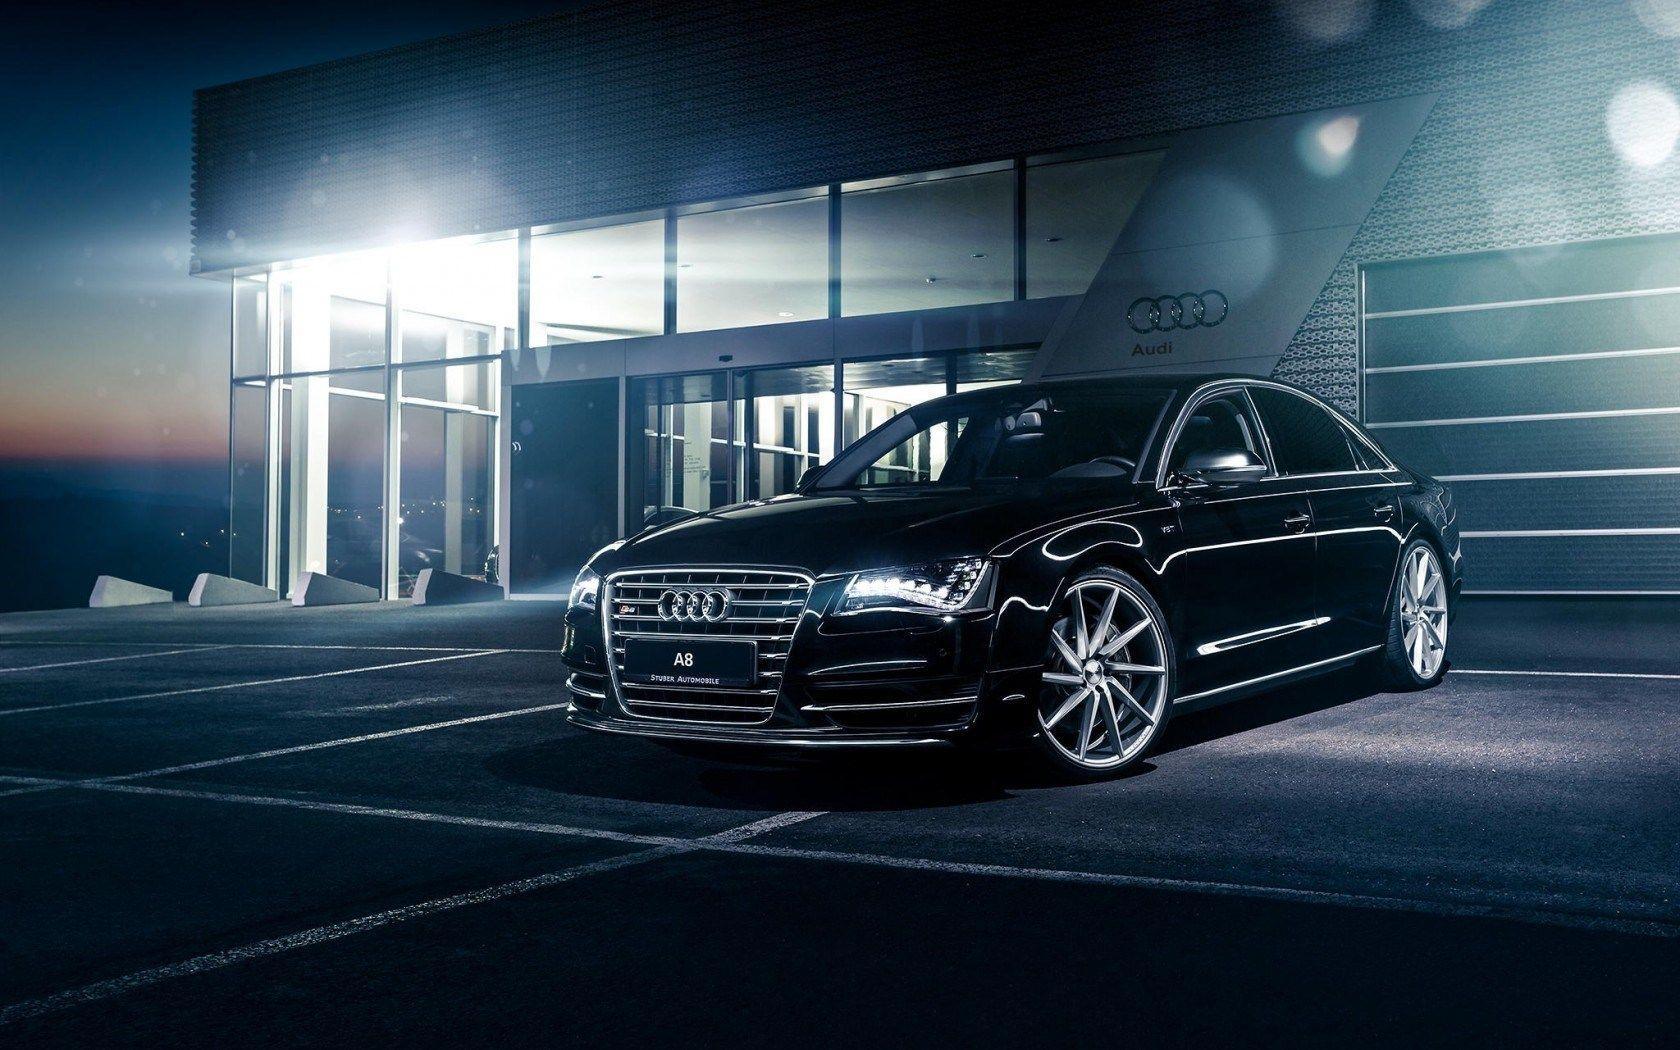 Audi A8 Wallpapers   Top Audi A8 Backgrounds   WallpaperAccess 1680x1050